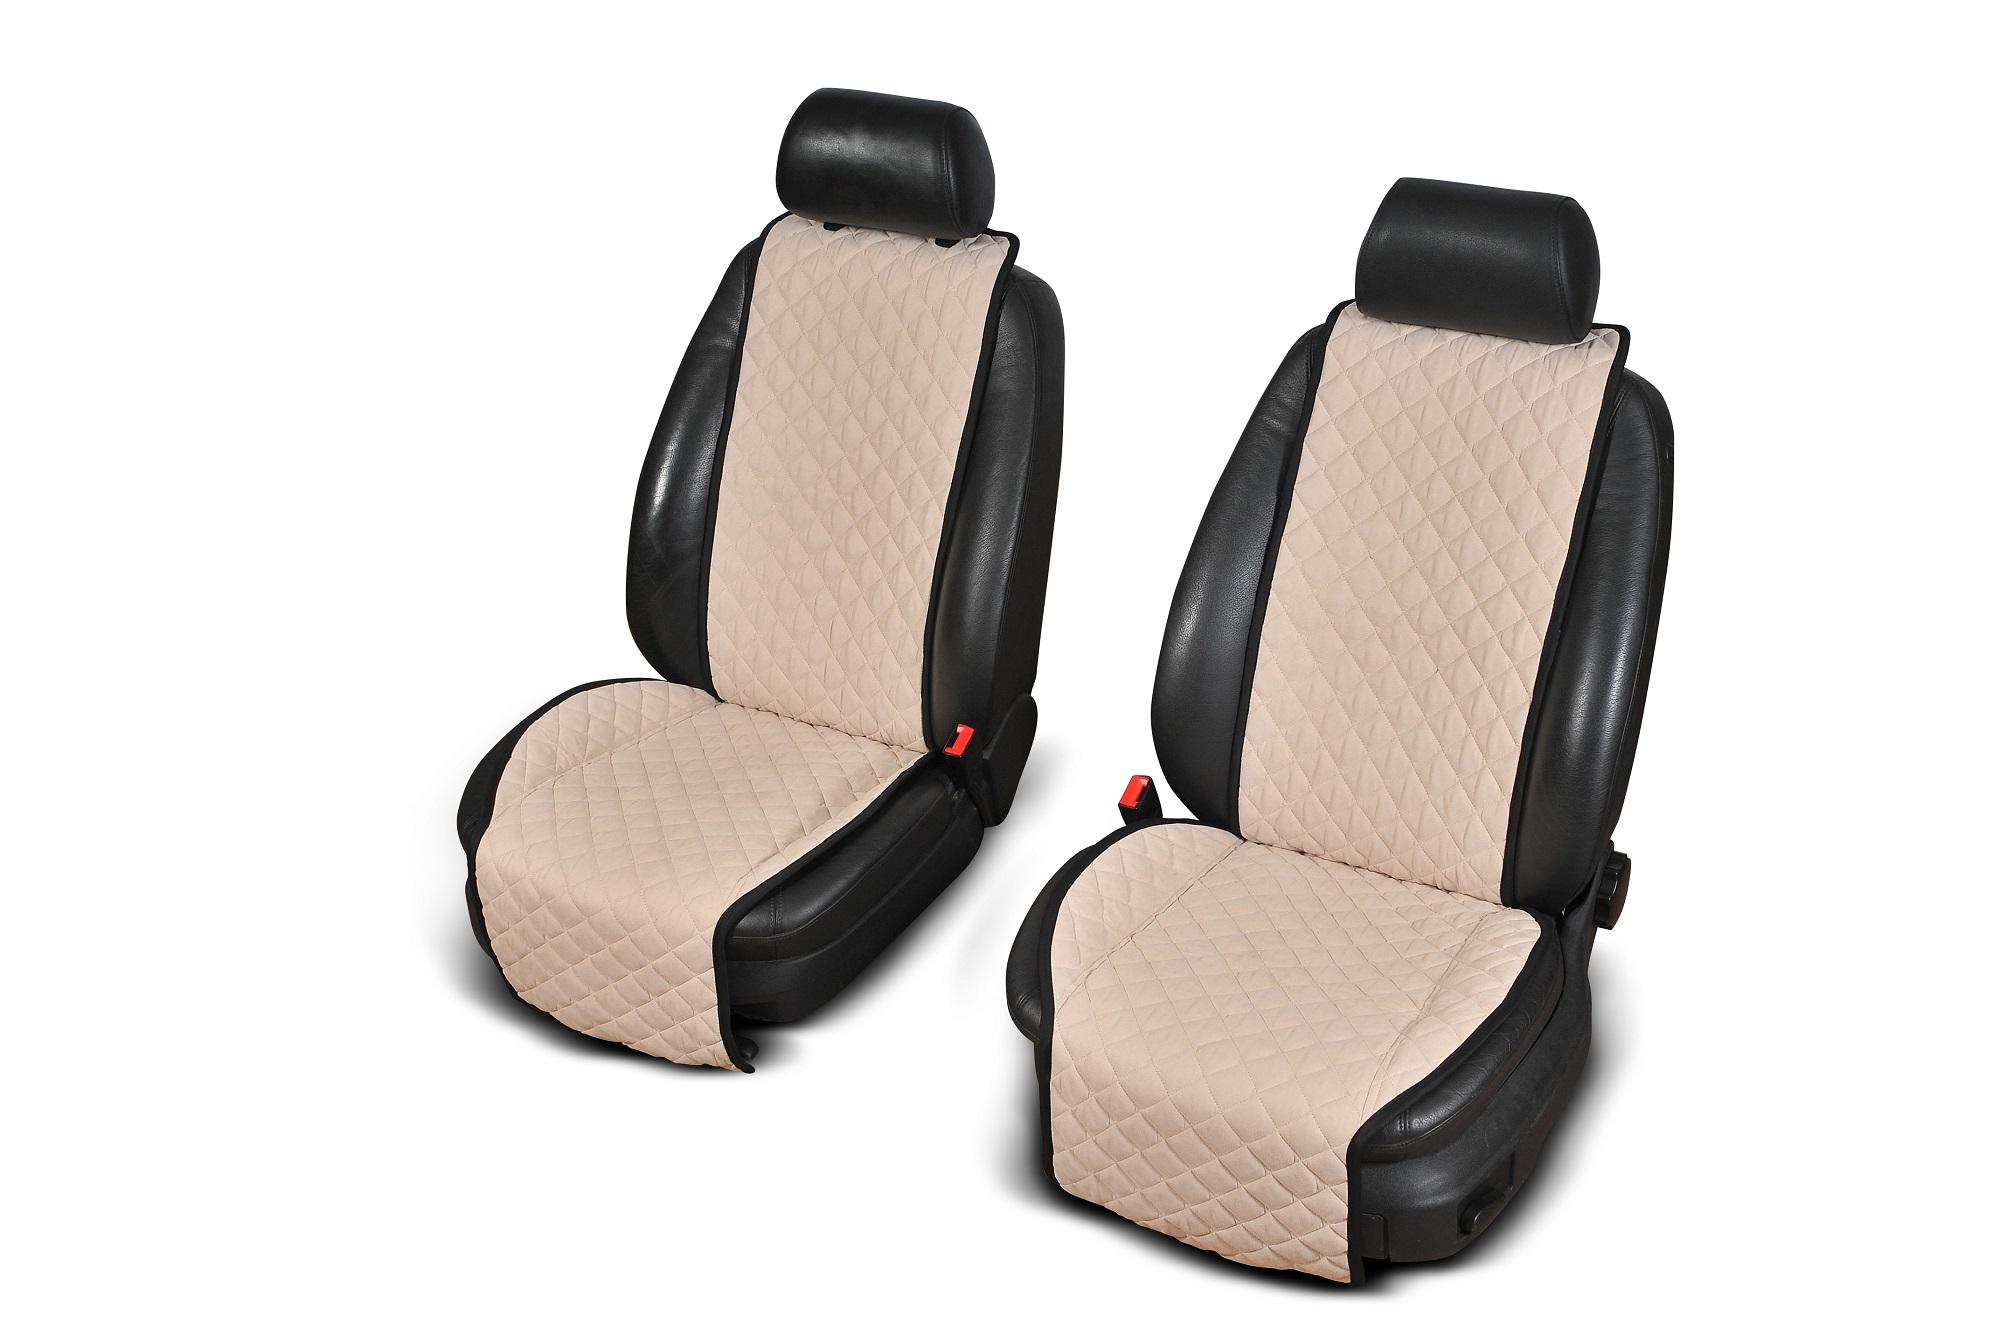 Autopotahy Cantra - ŠIROKÉ. 2x autopotahy na přední sedadla Barva: Modrá